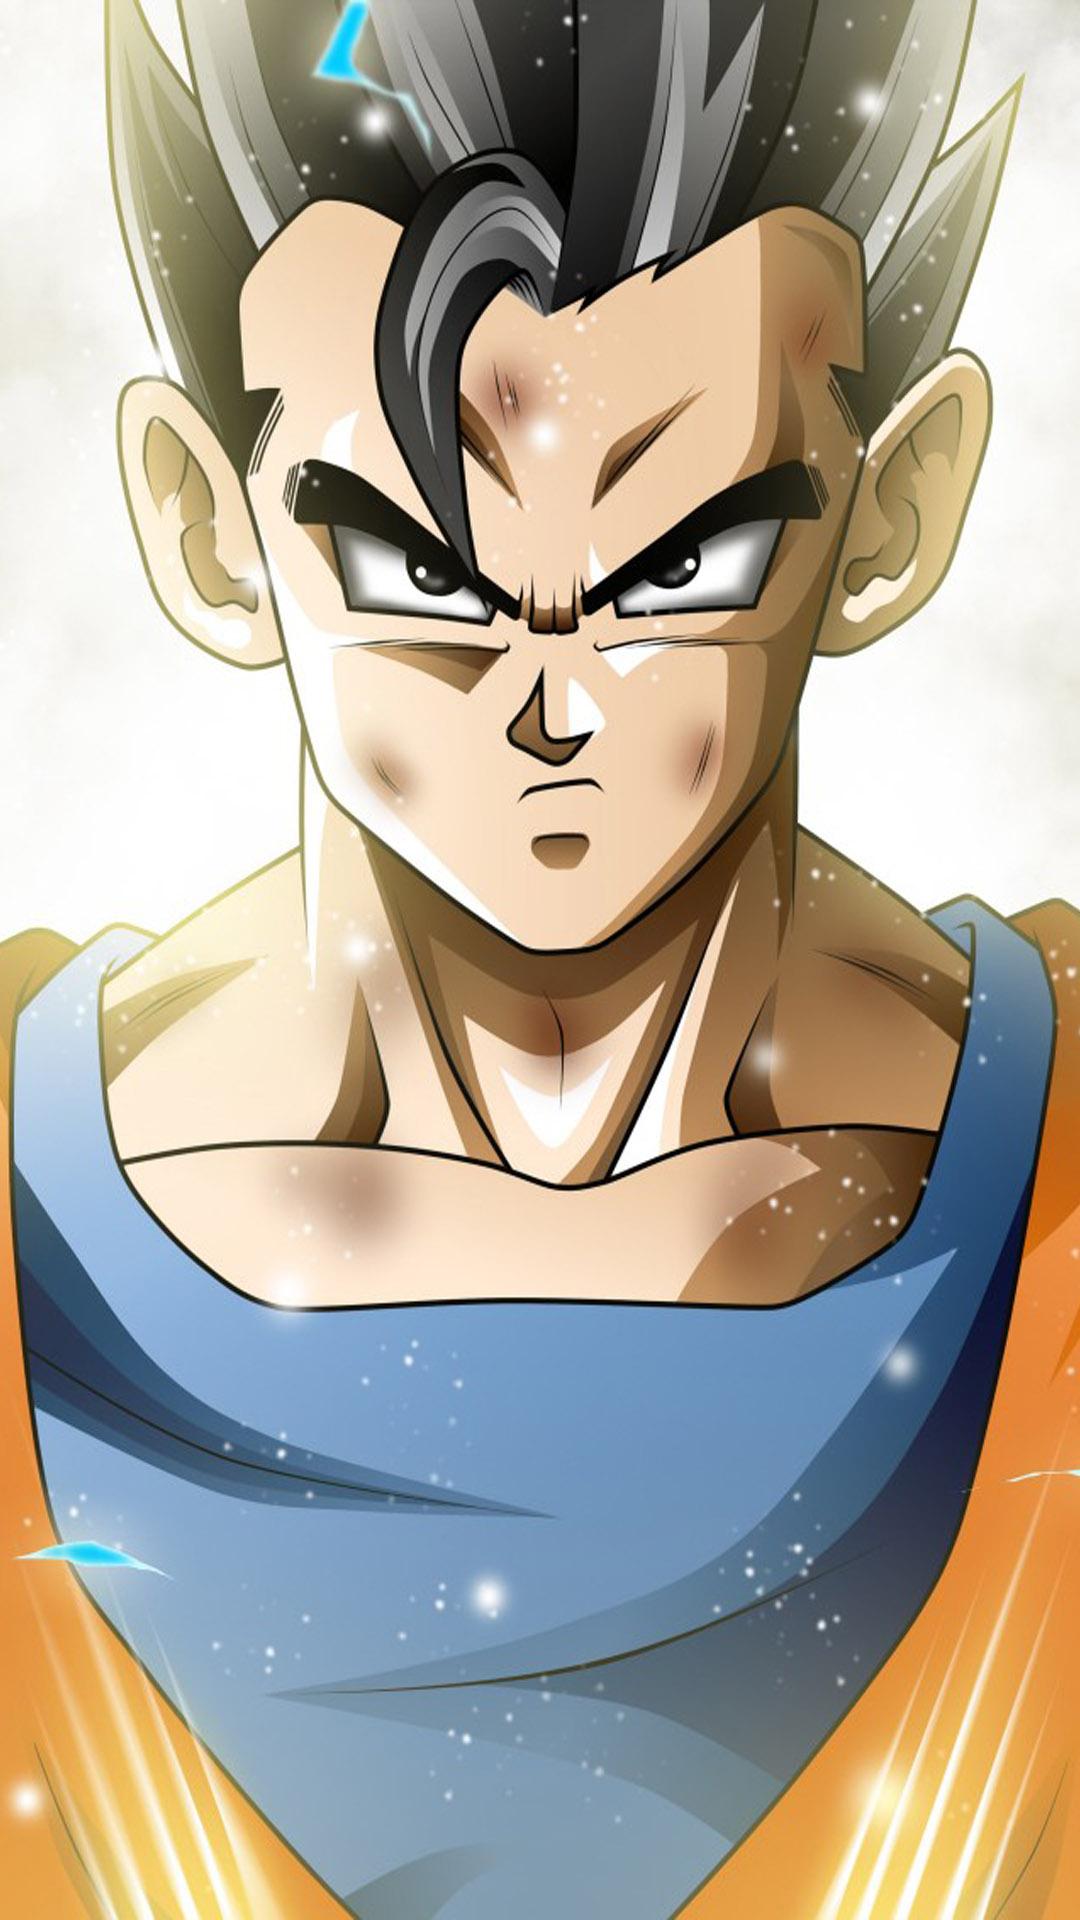 Ultimate Gohan Dragon Ball Super Free 4k Ultra Hd Mobile